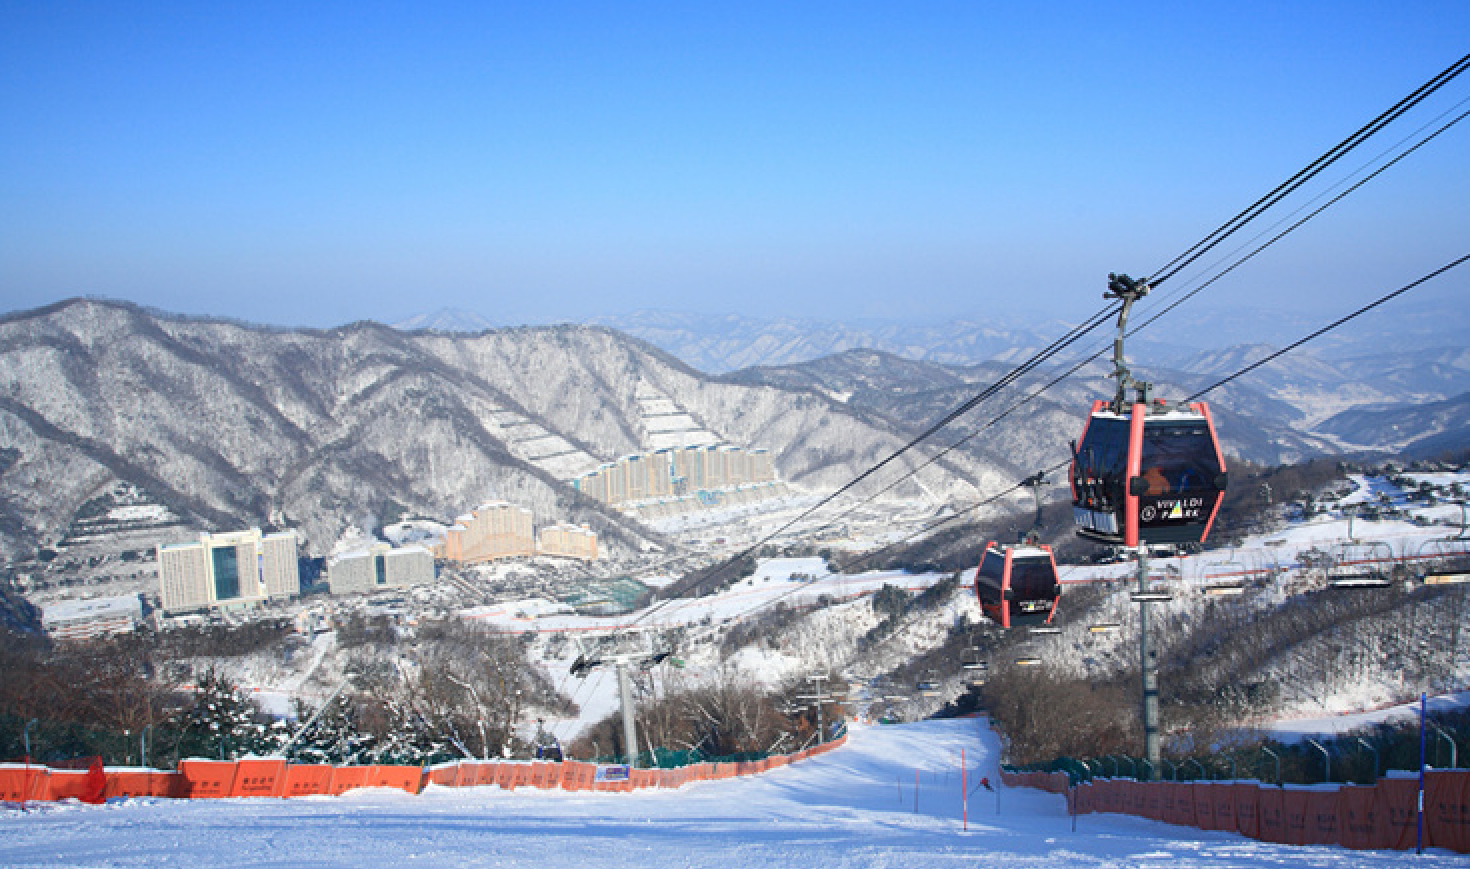 daemyung vivaldi ski resort private ski lesson package l onedaykorea